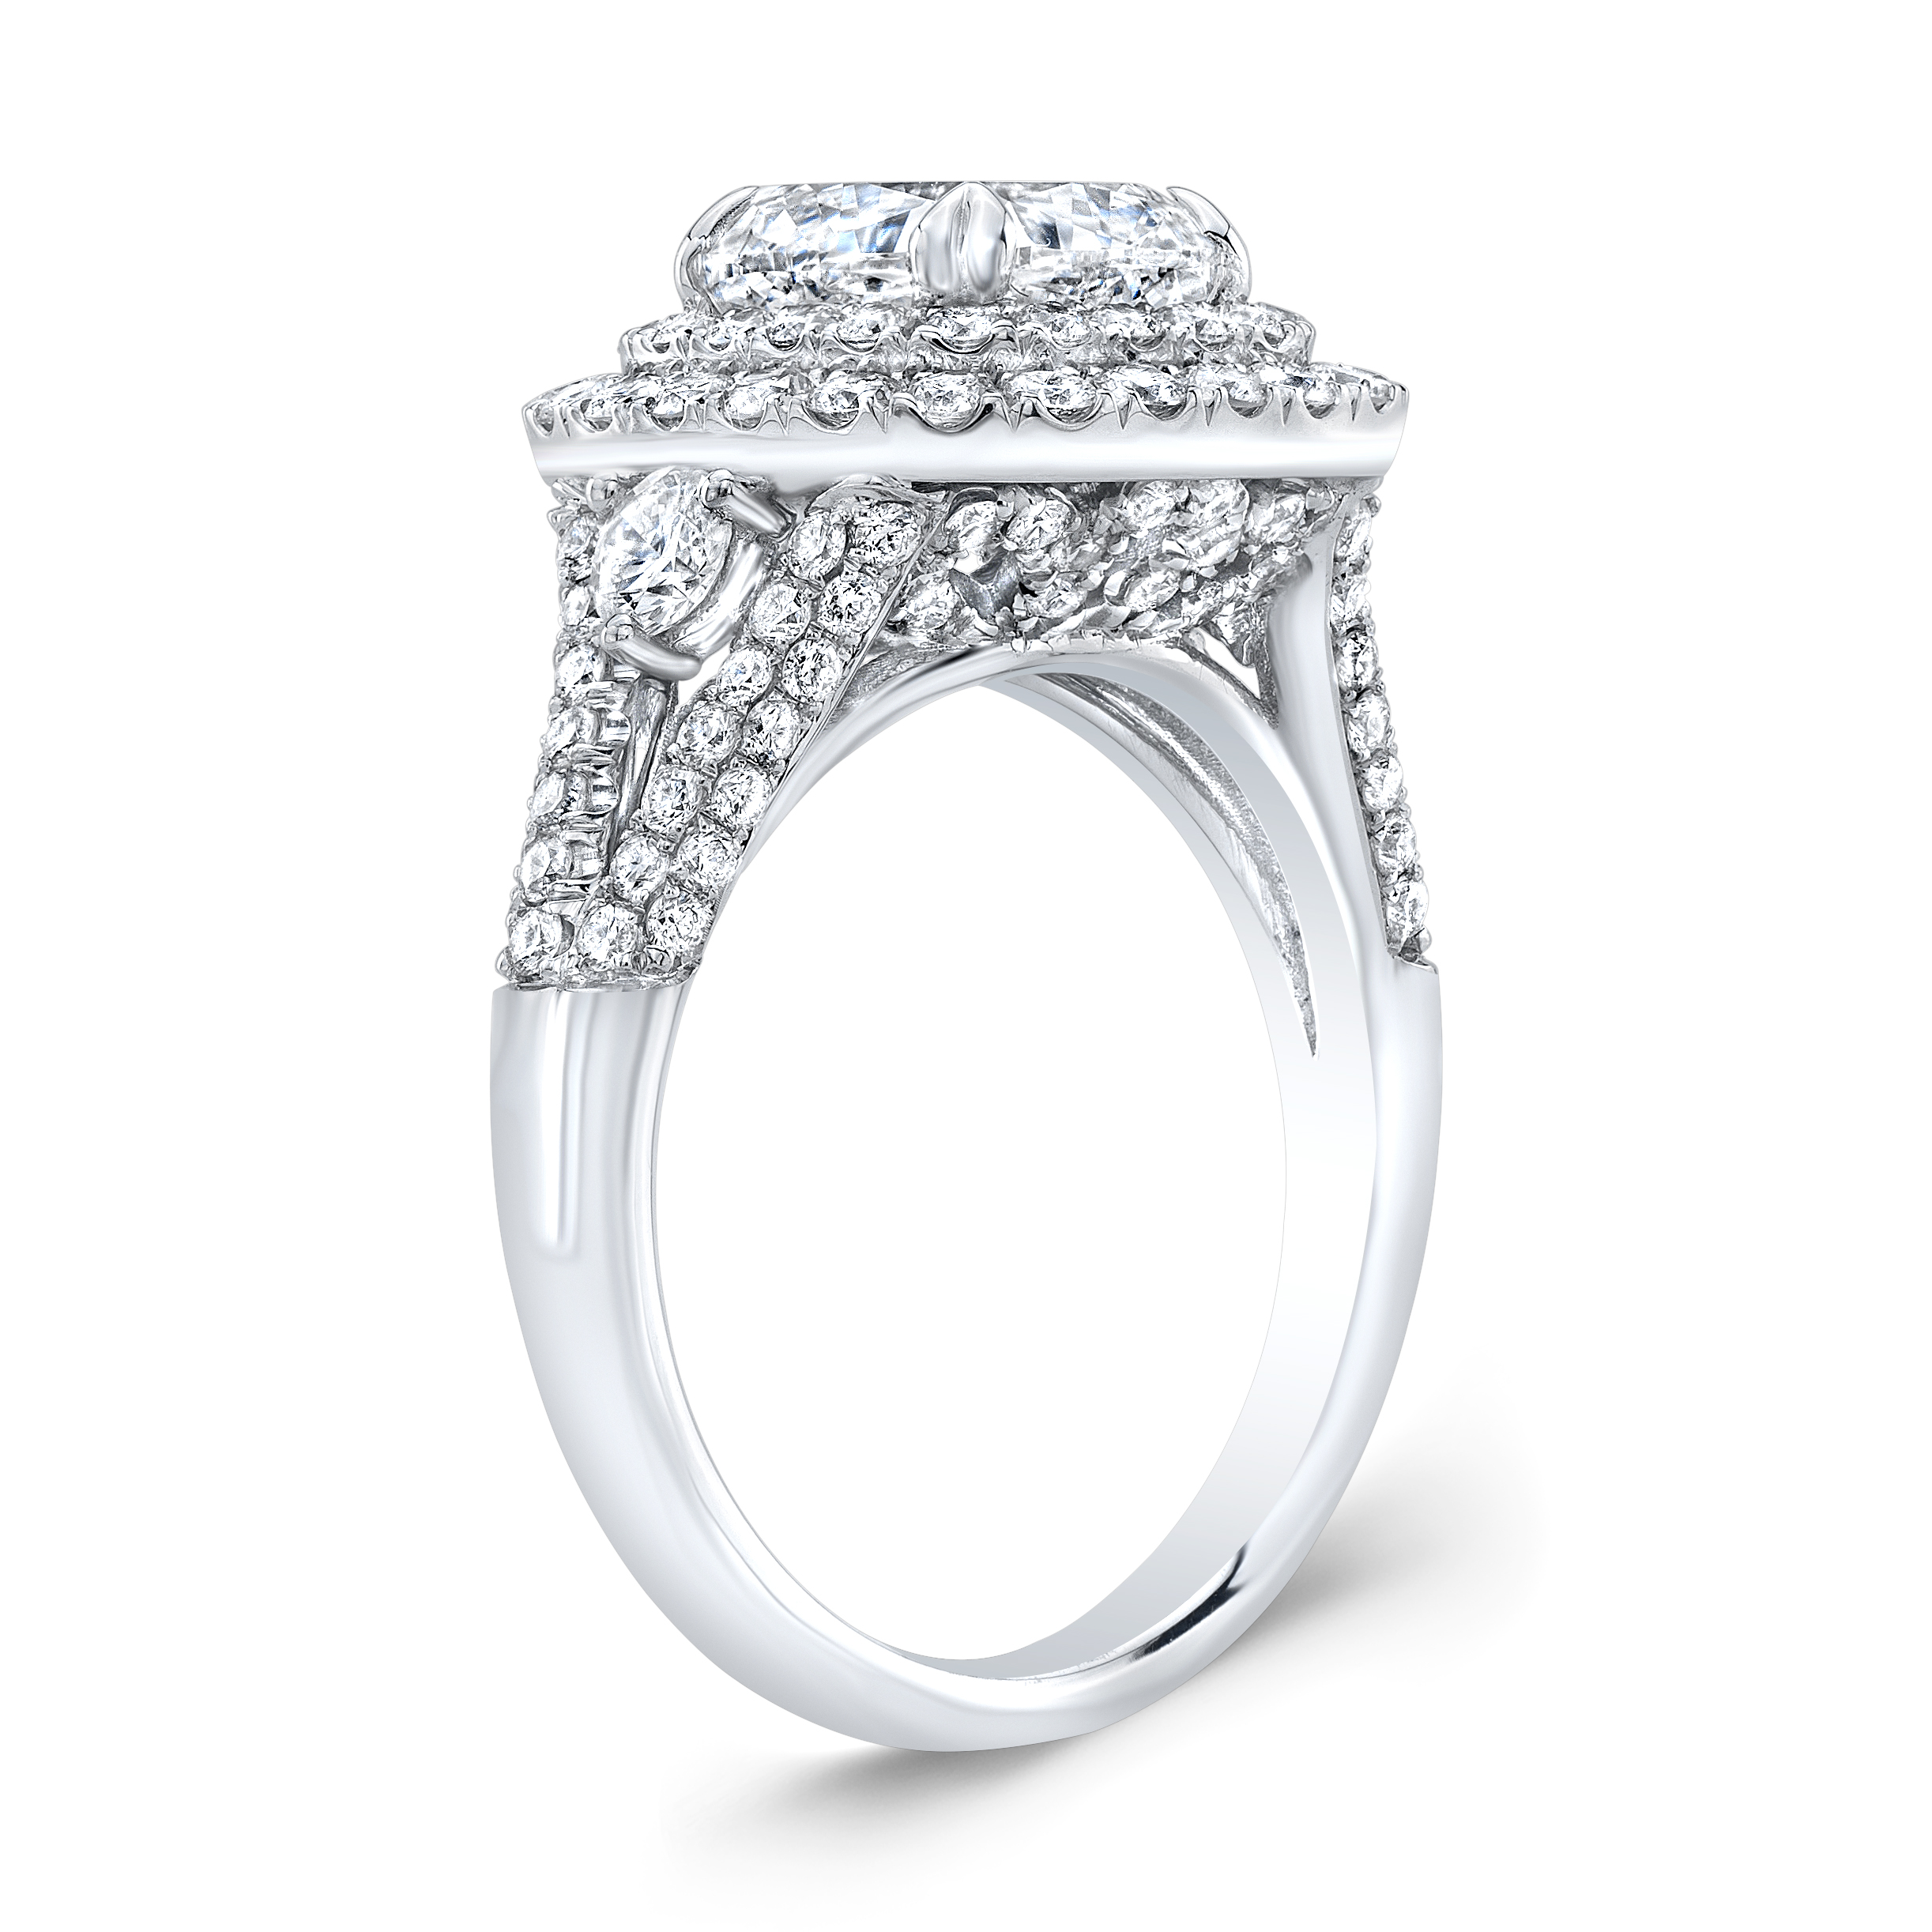 Double Halo Split Shank Micro Pave Diamond Engagement Ring